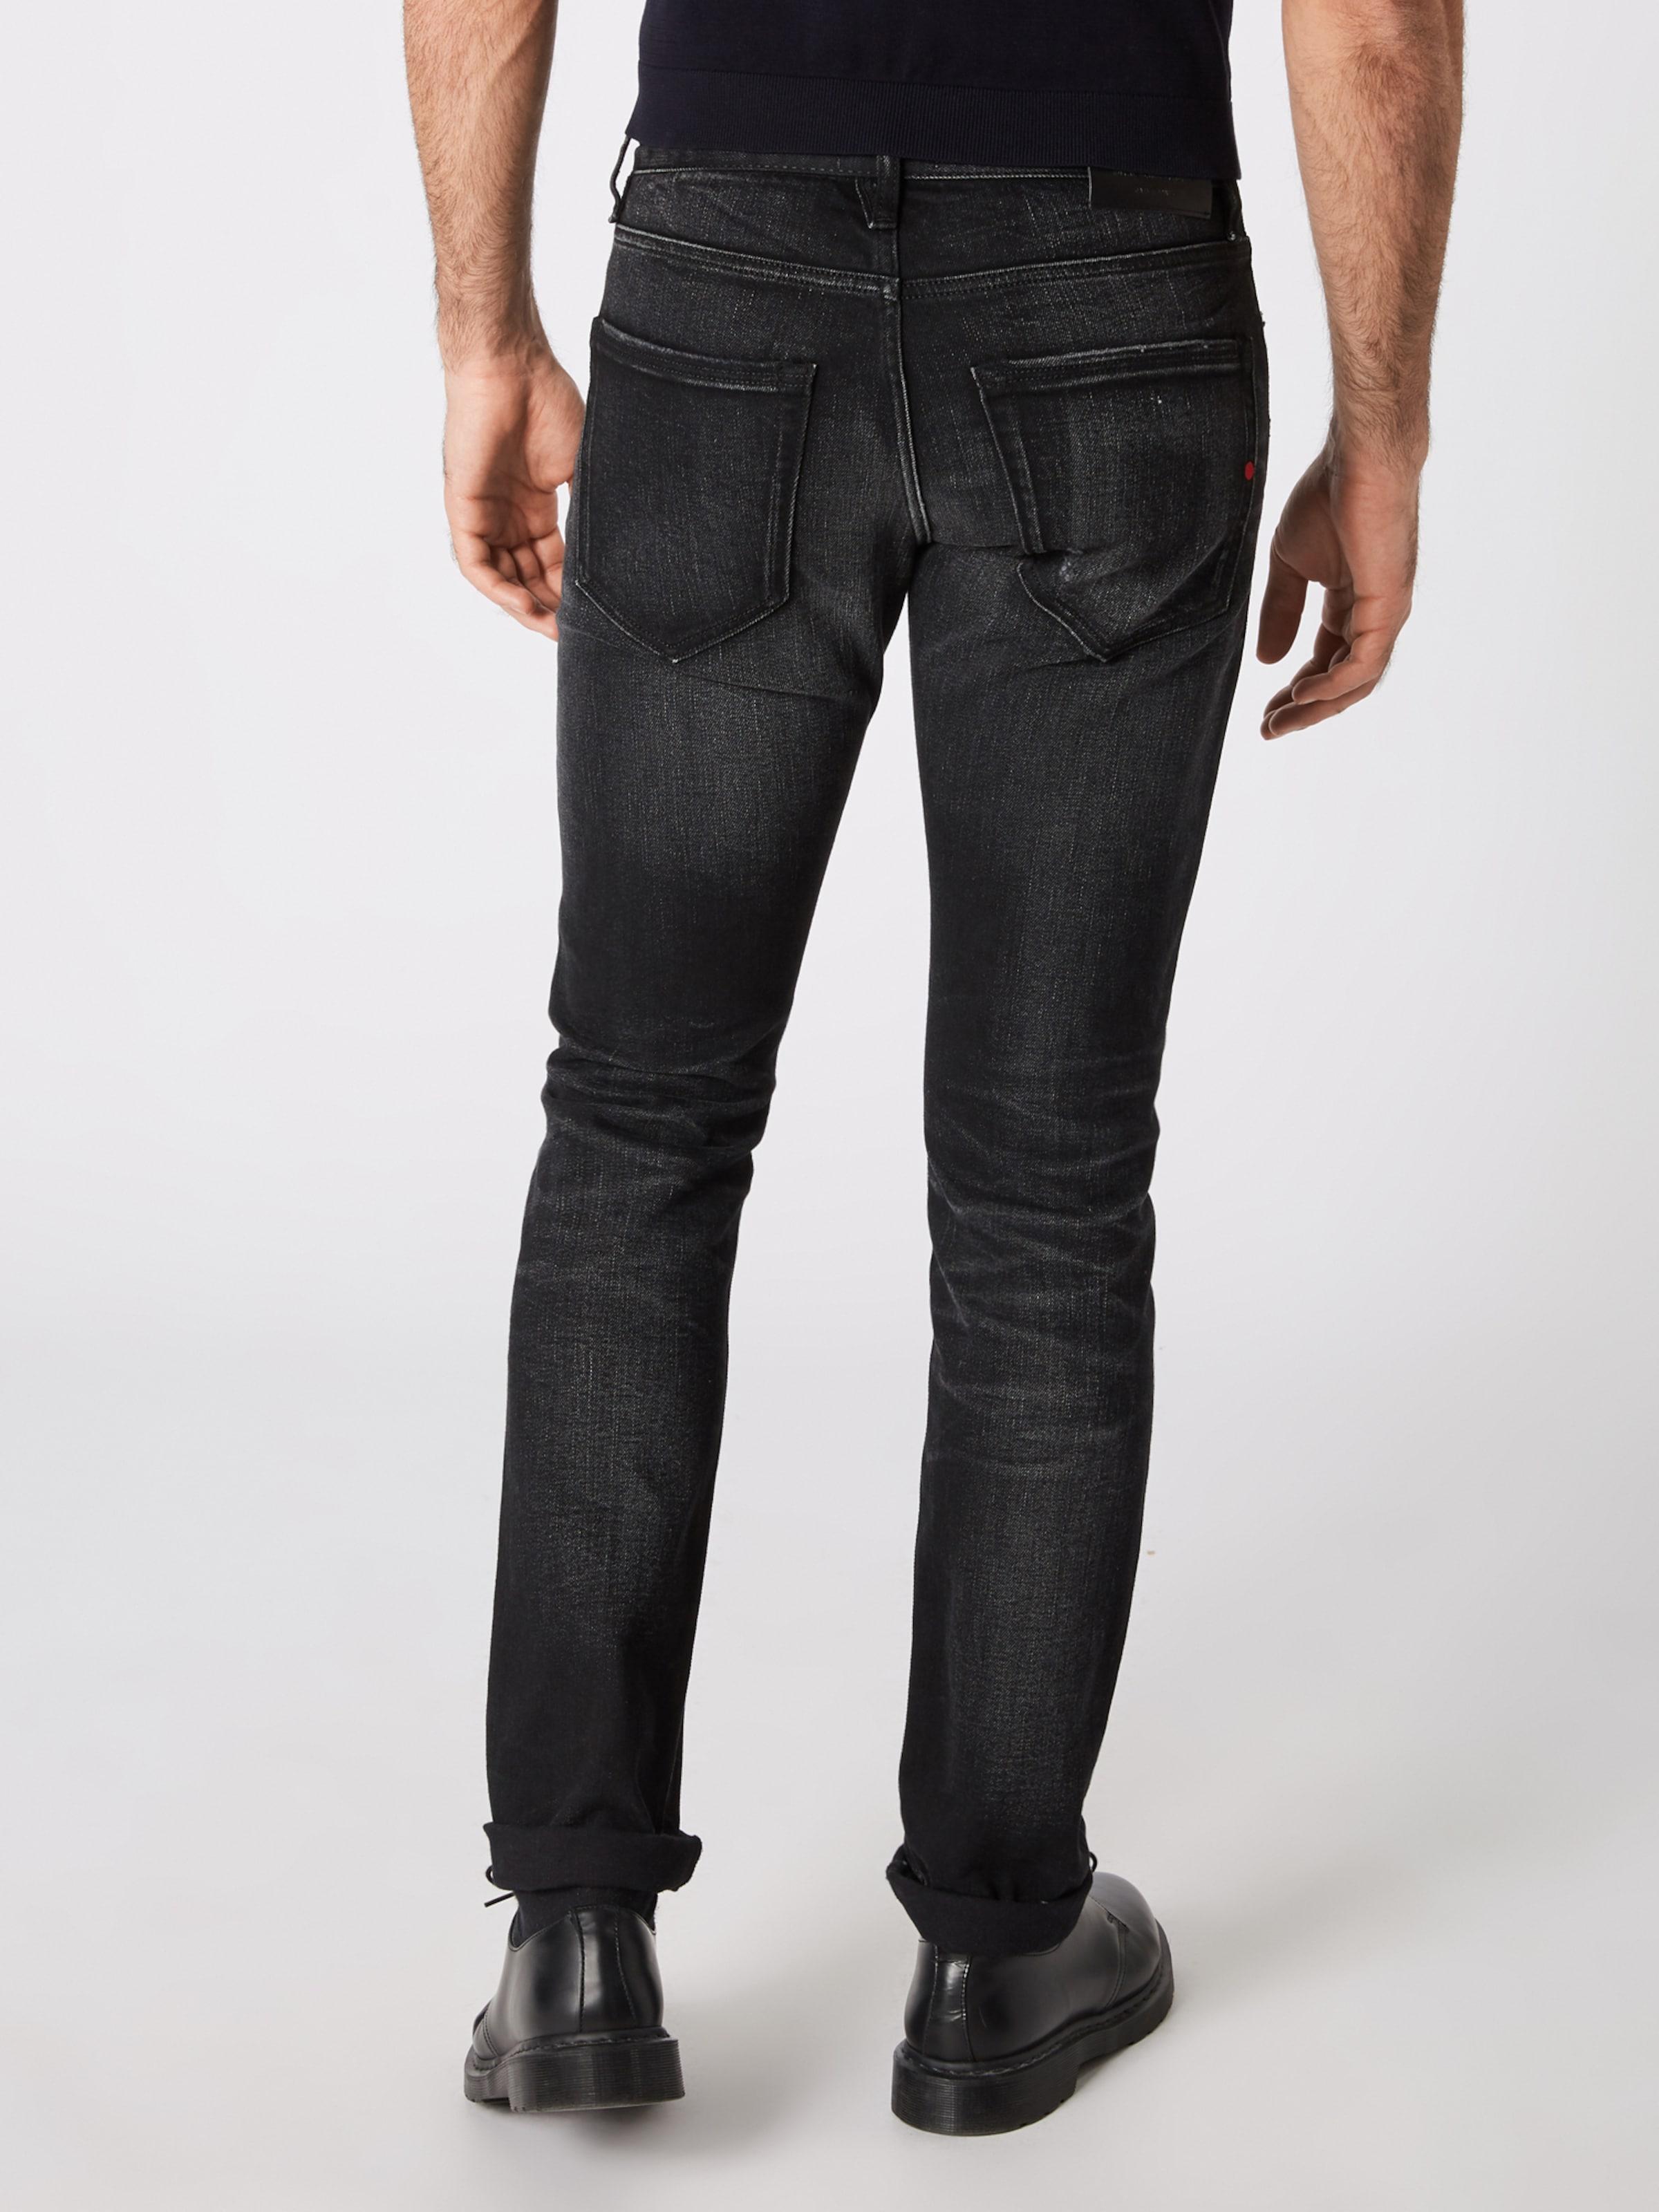 Rdd' Denim R202 Jeans In Jackamp; Jones Black 'jjiglenn Jjroyal yvwmN8On0